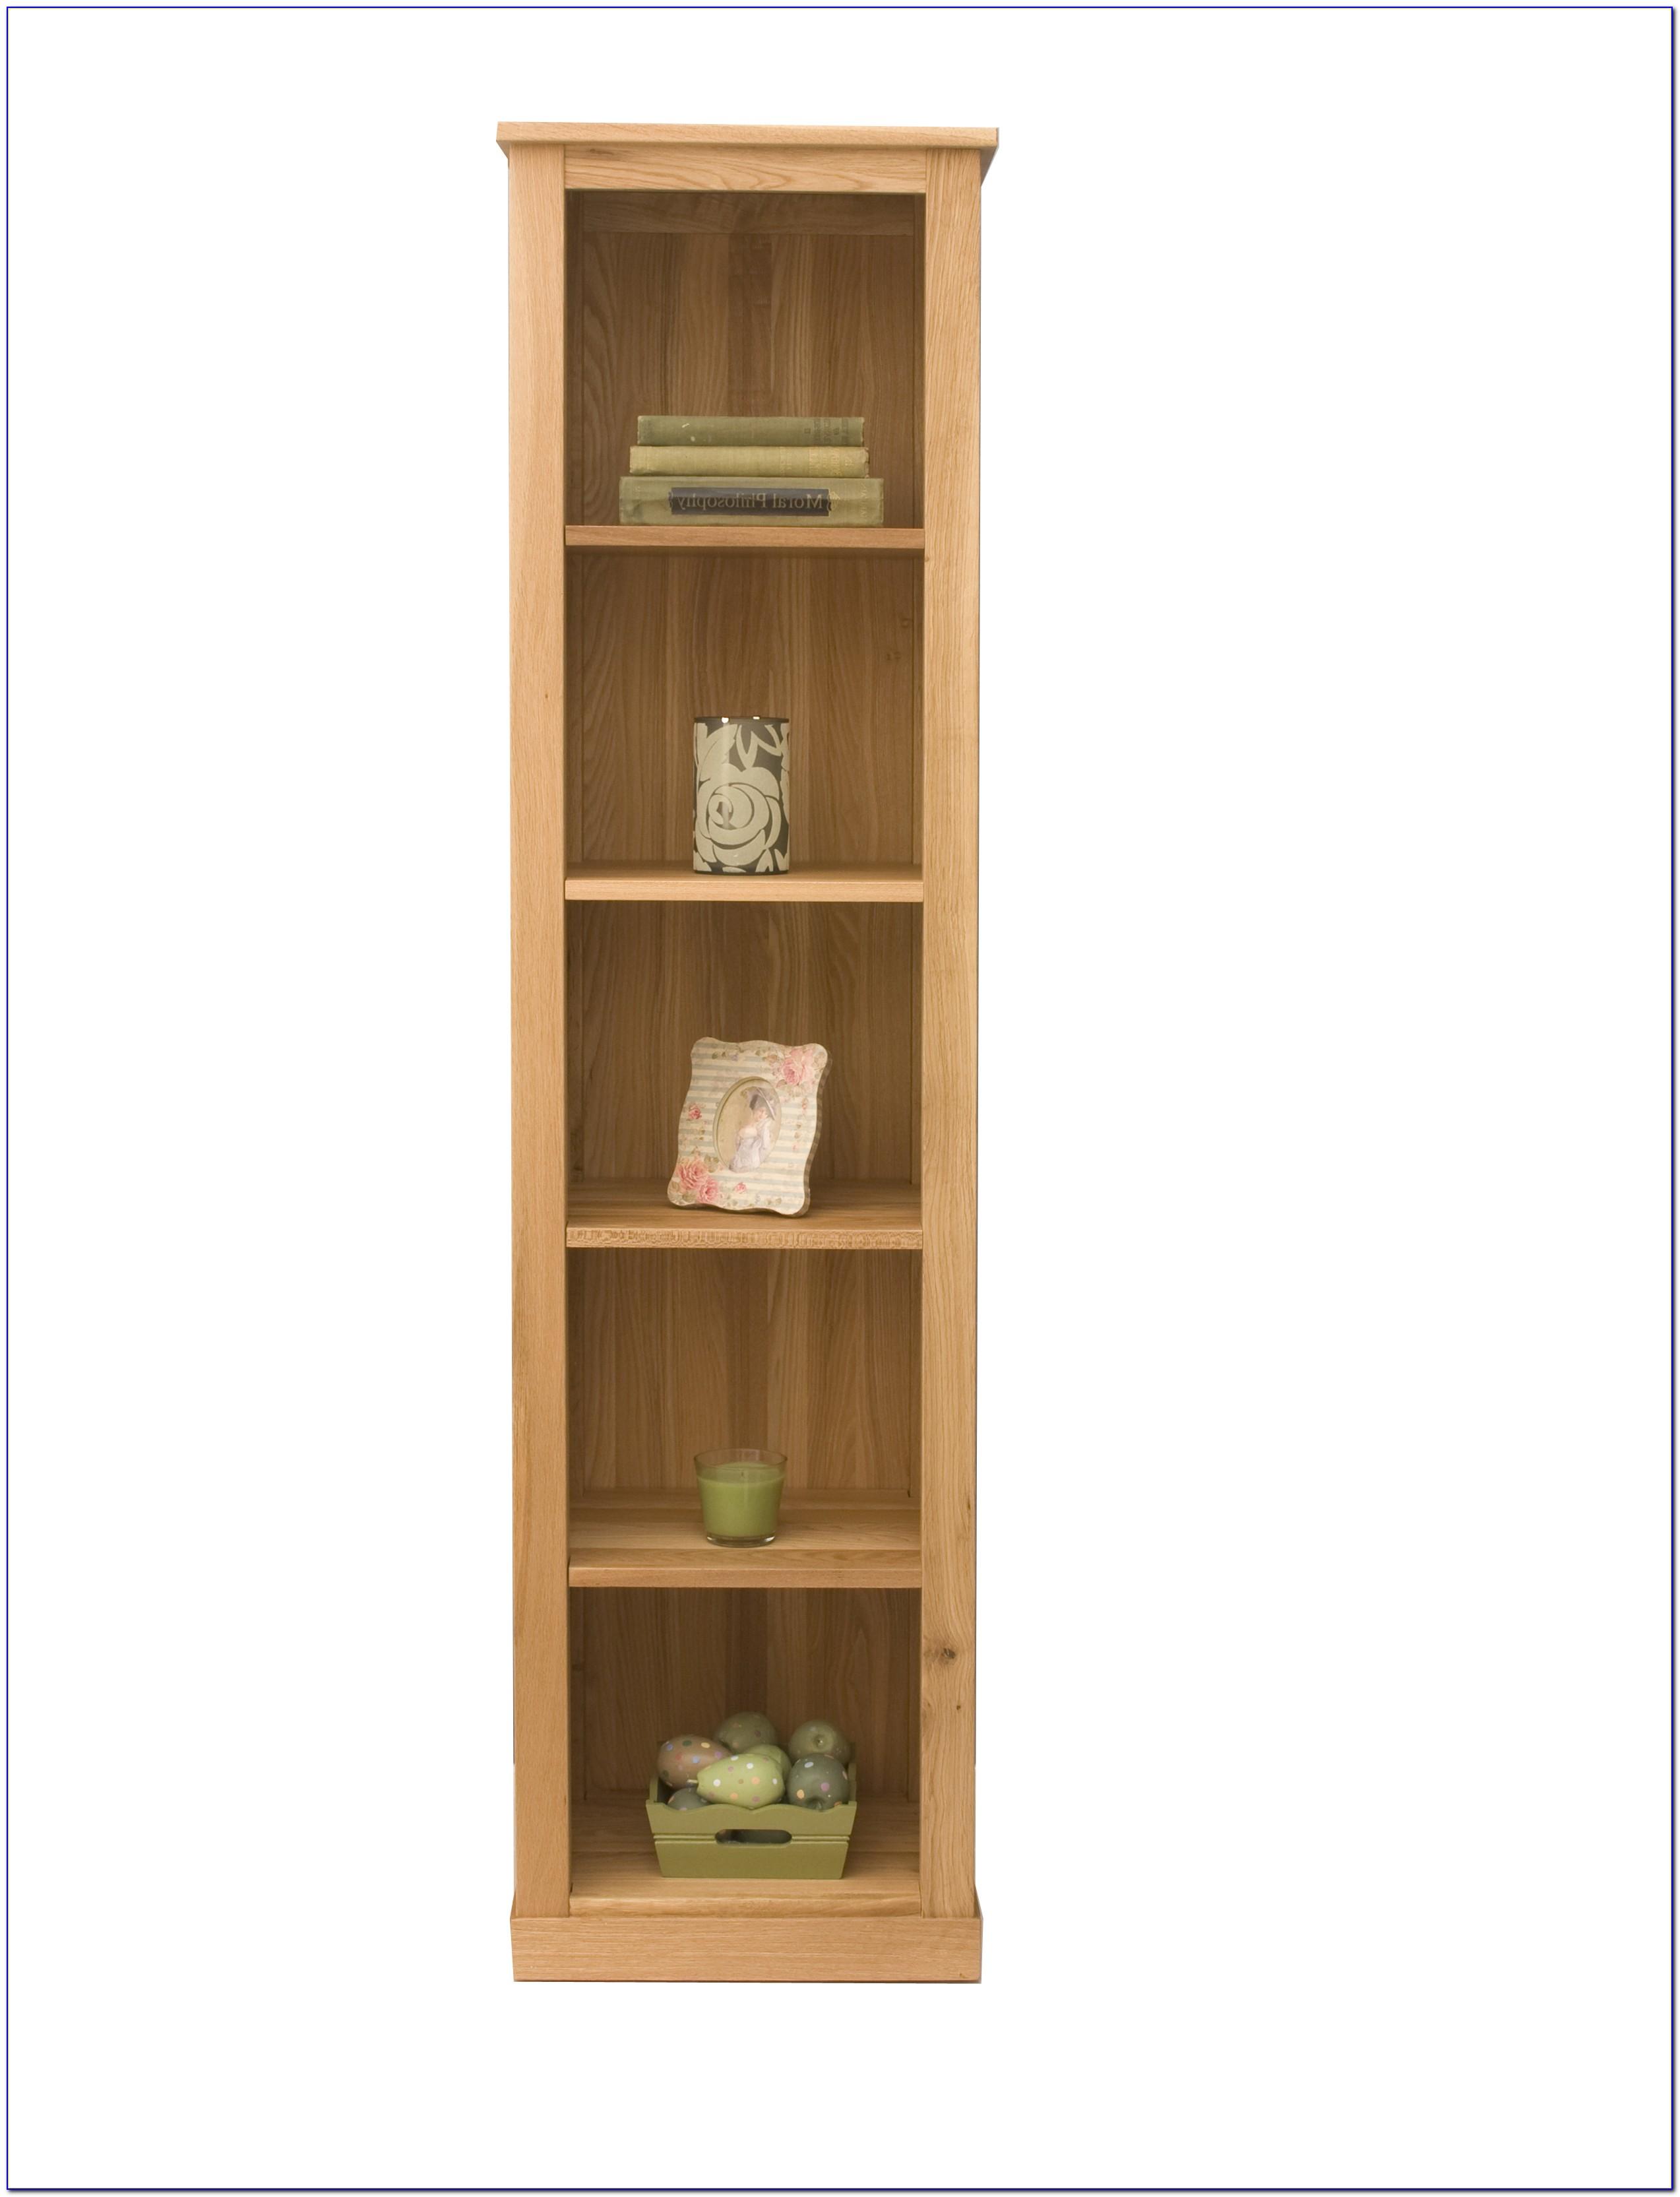 Oak Narrow Bookshelves